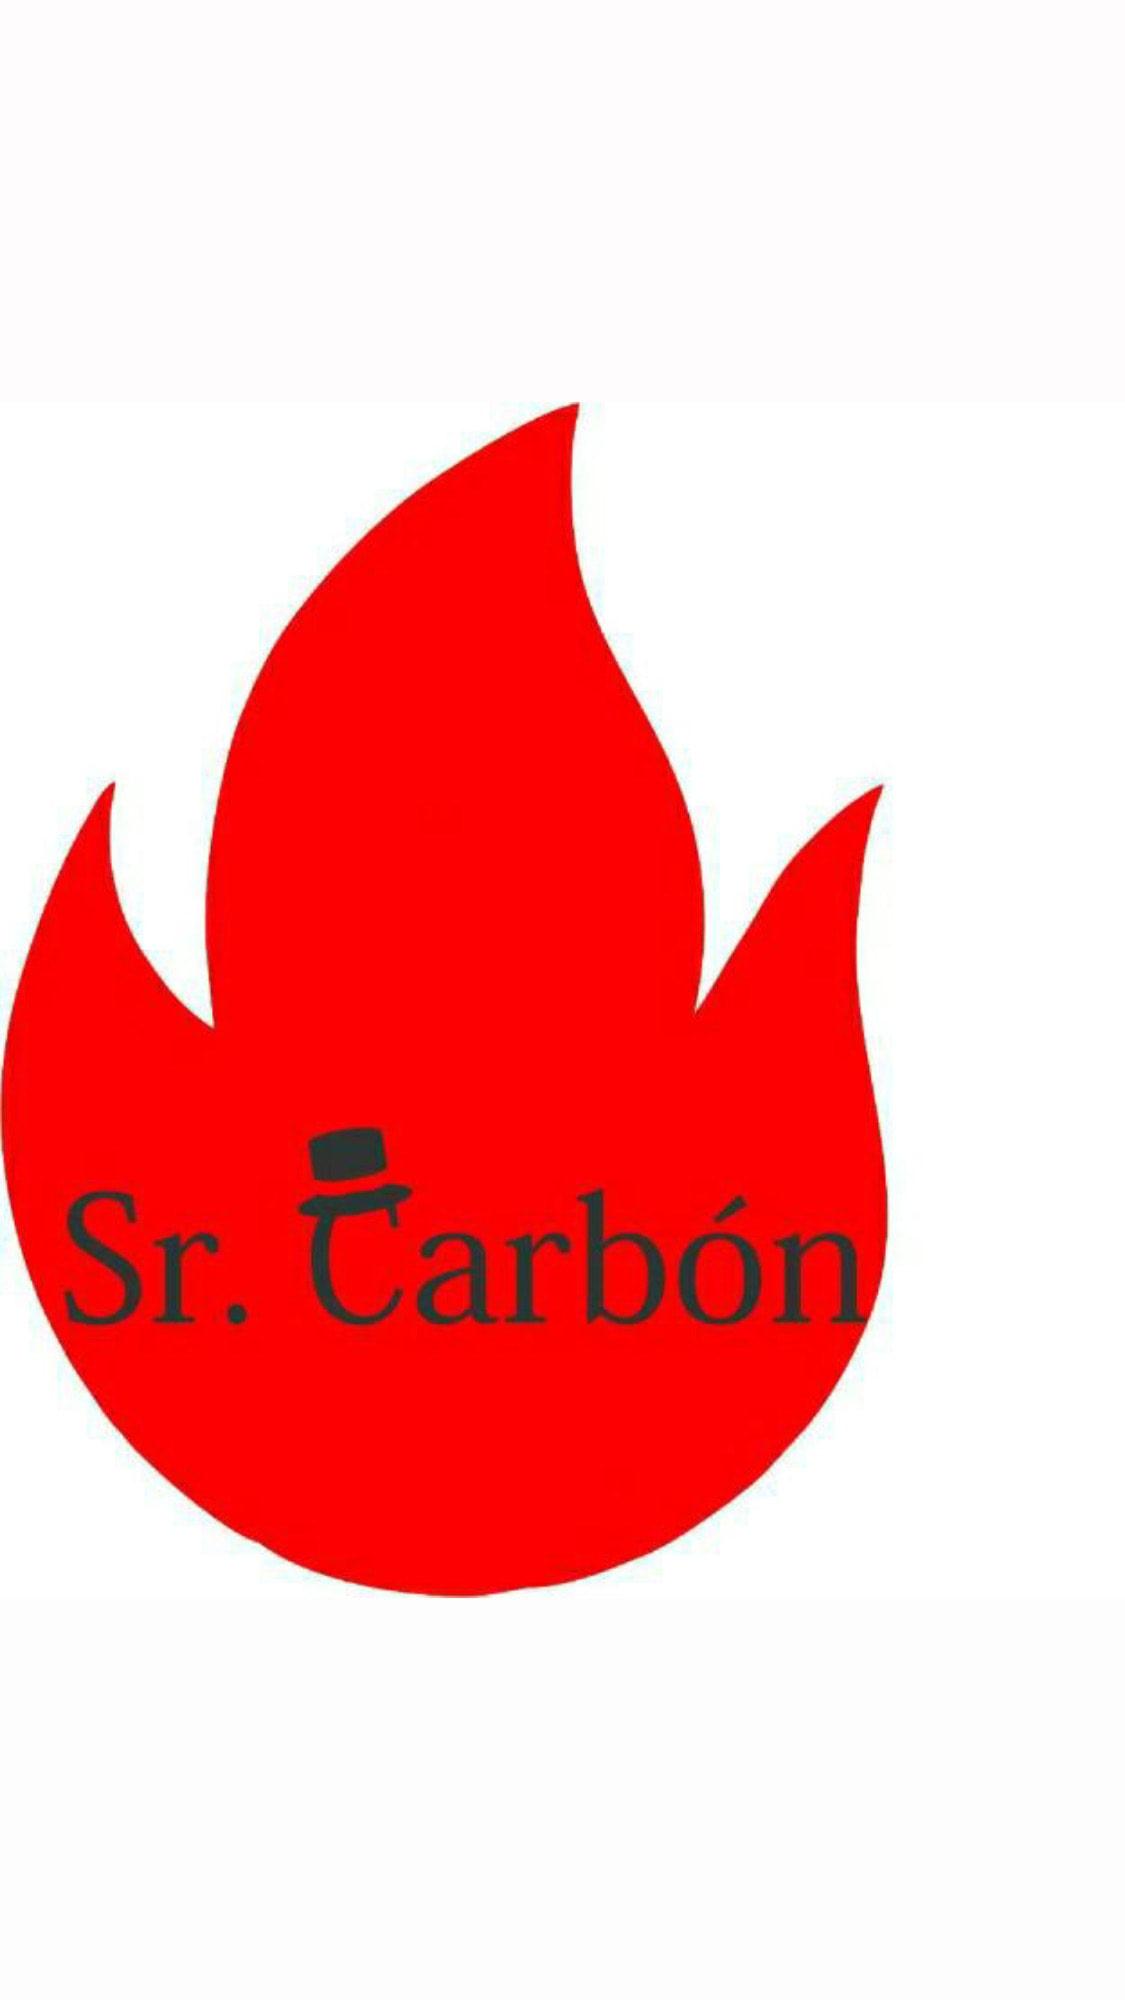 Señor Carbón